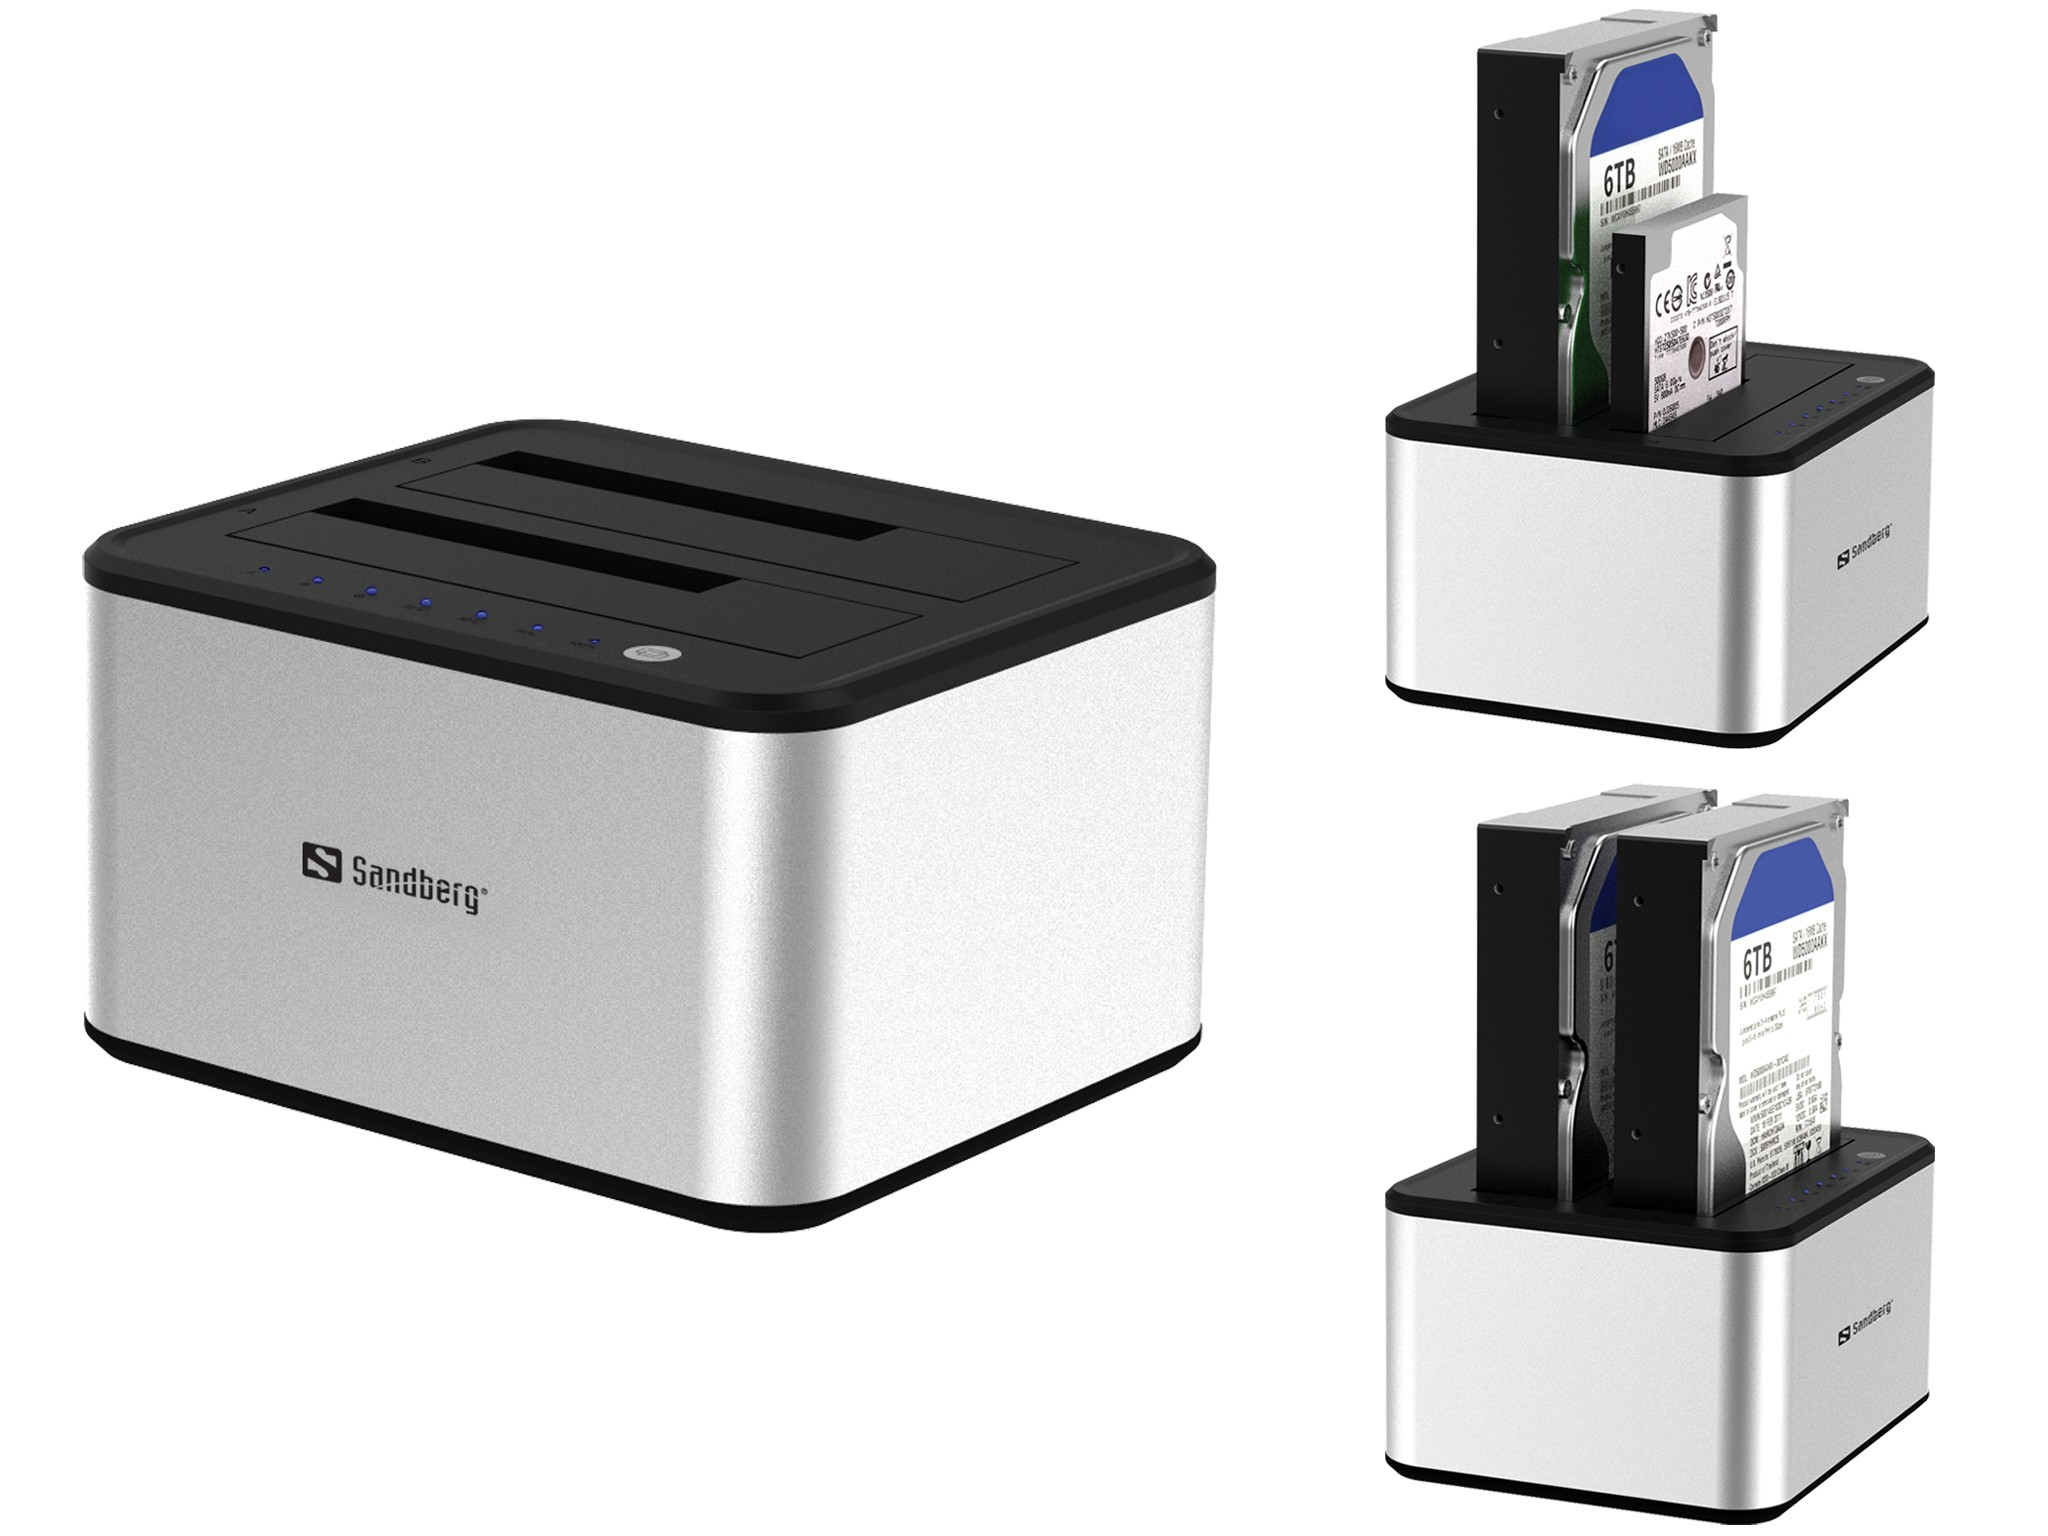 Sandberg USB 3.0 HDD Cloner - 133-74